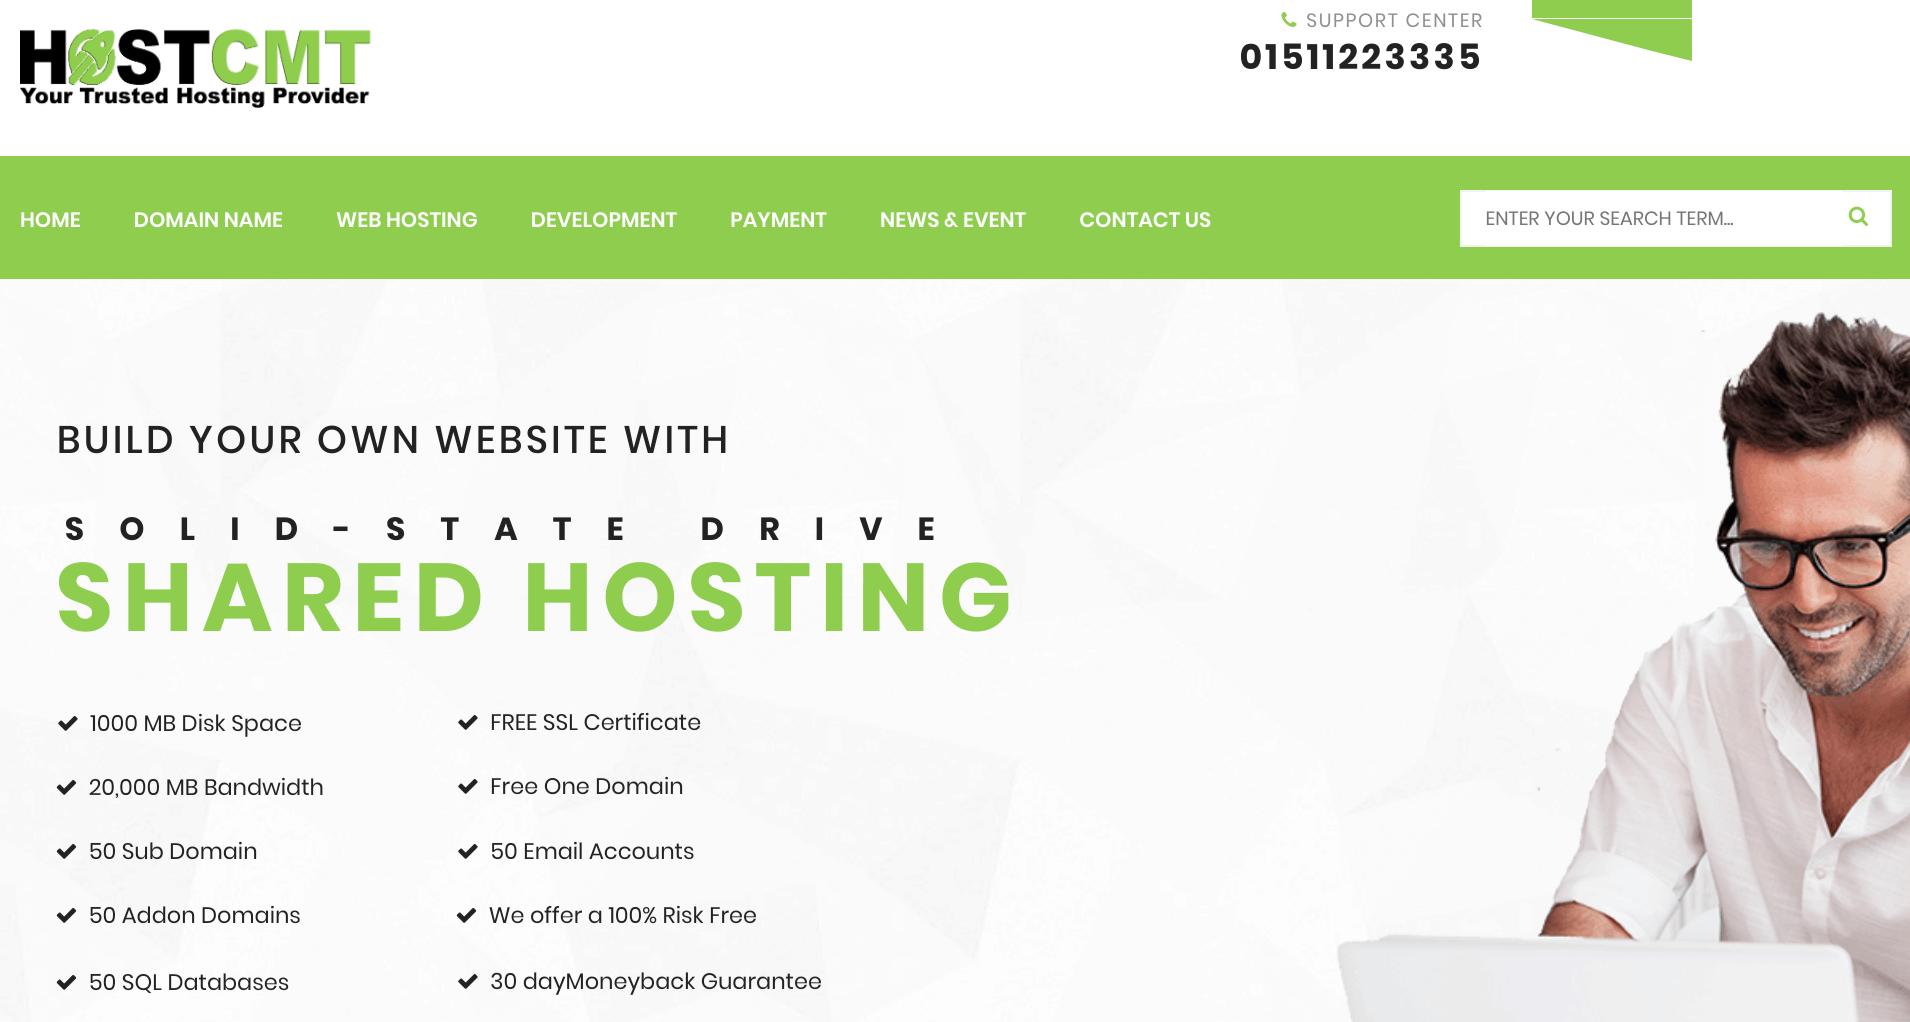 HostCmt